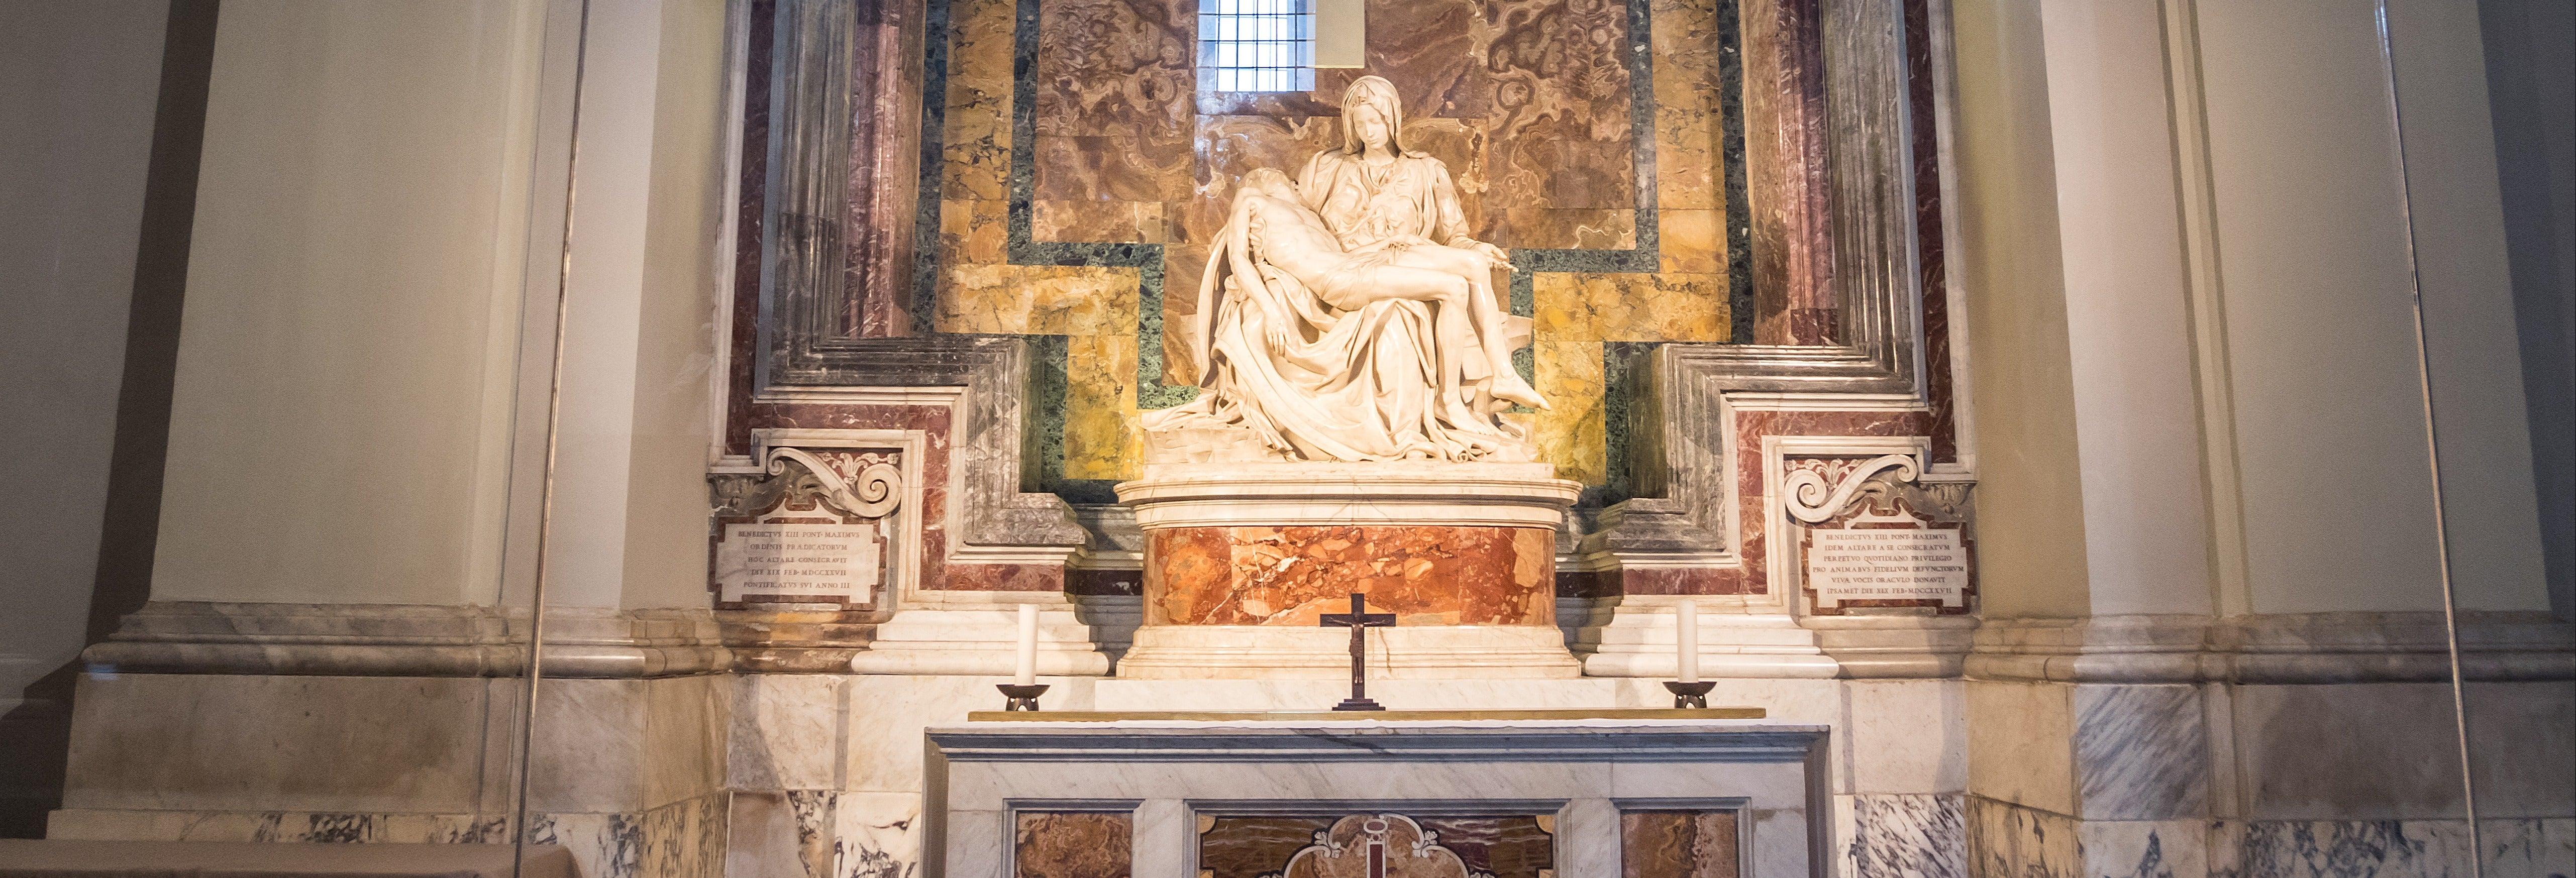 St. Peter's Basilica and Necropolis Tour